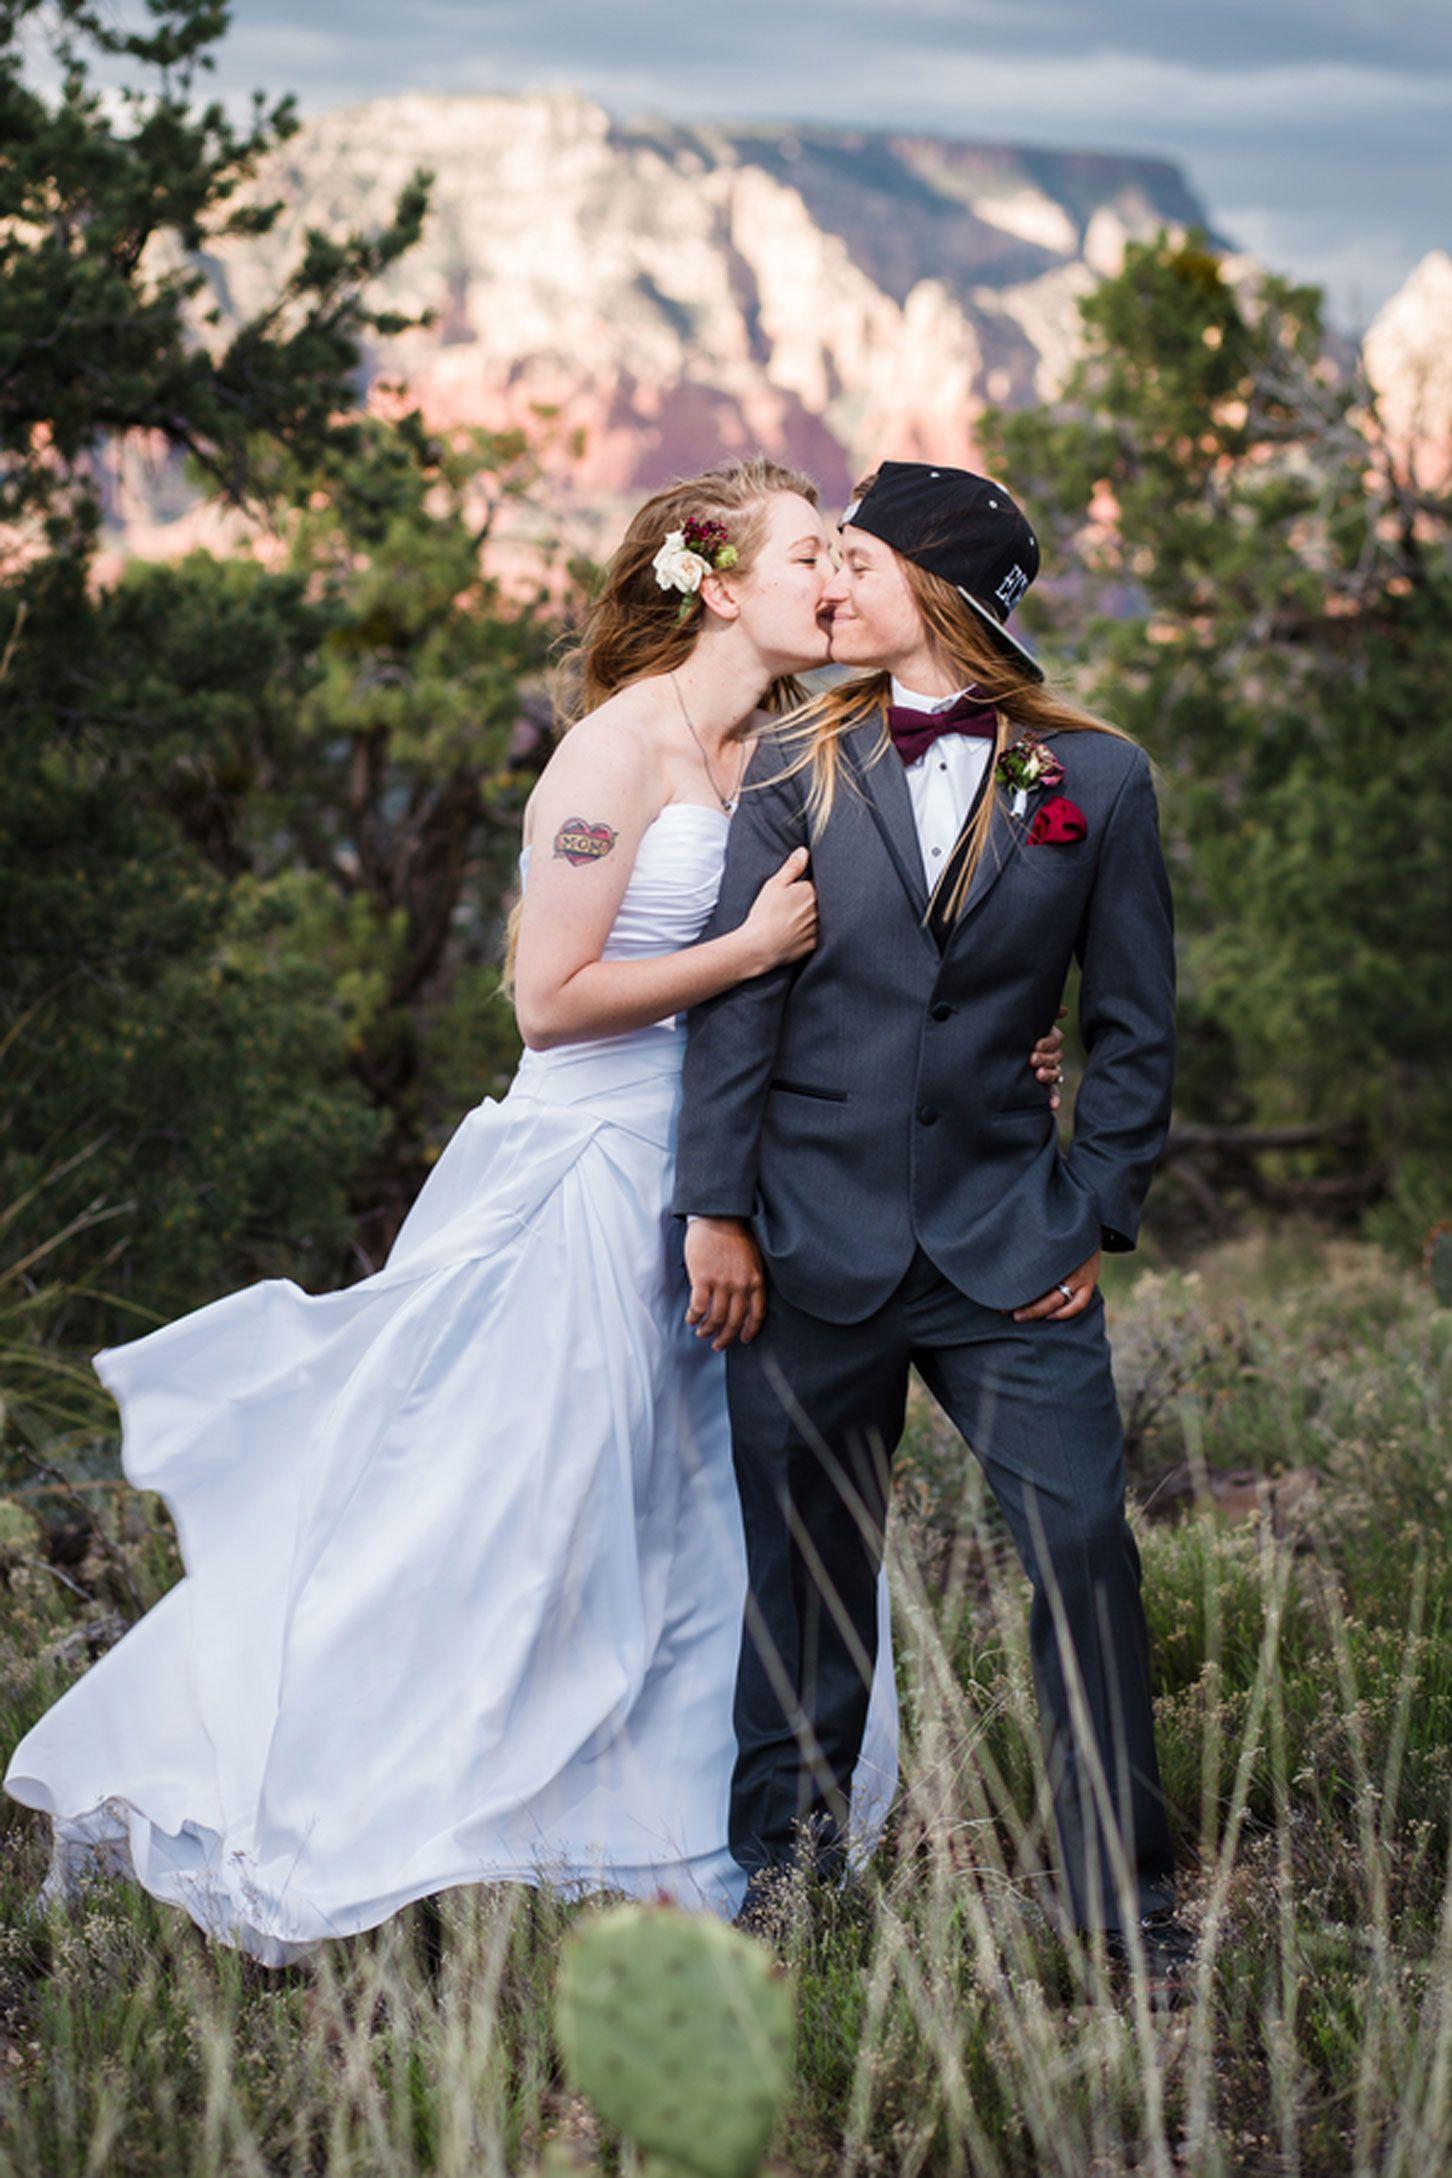 Gay and Lgbt wedding